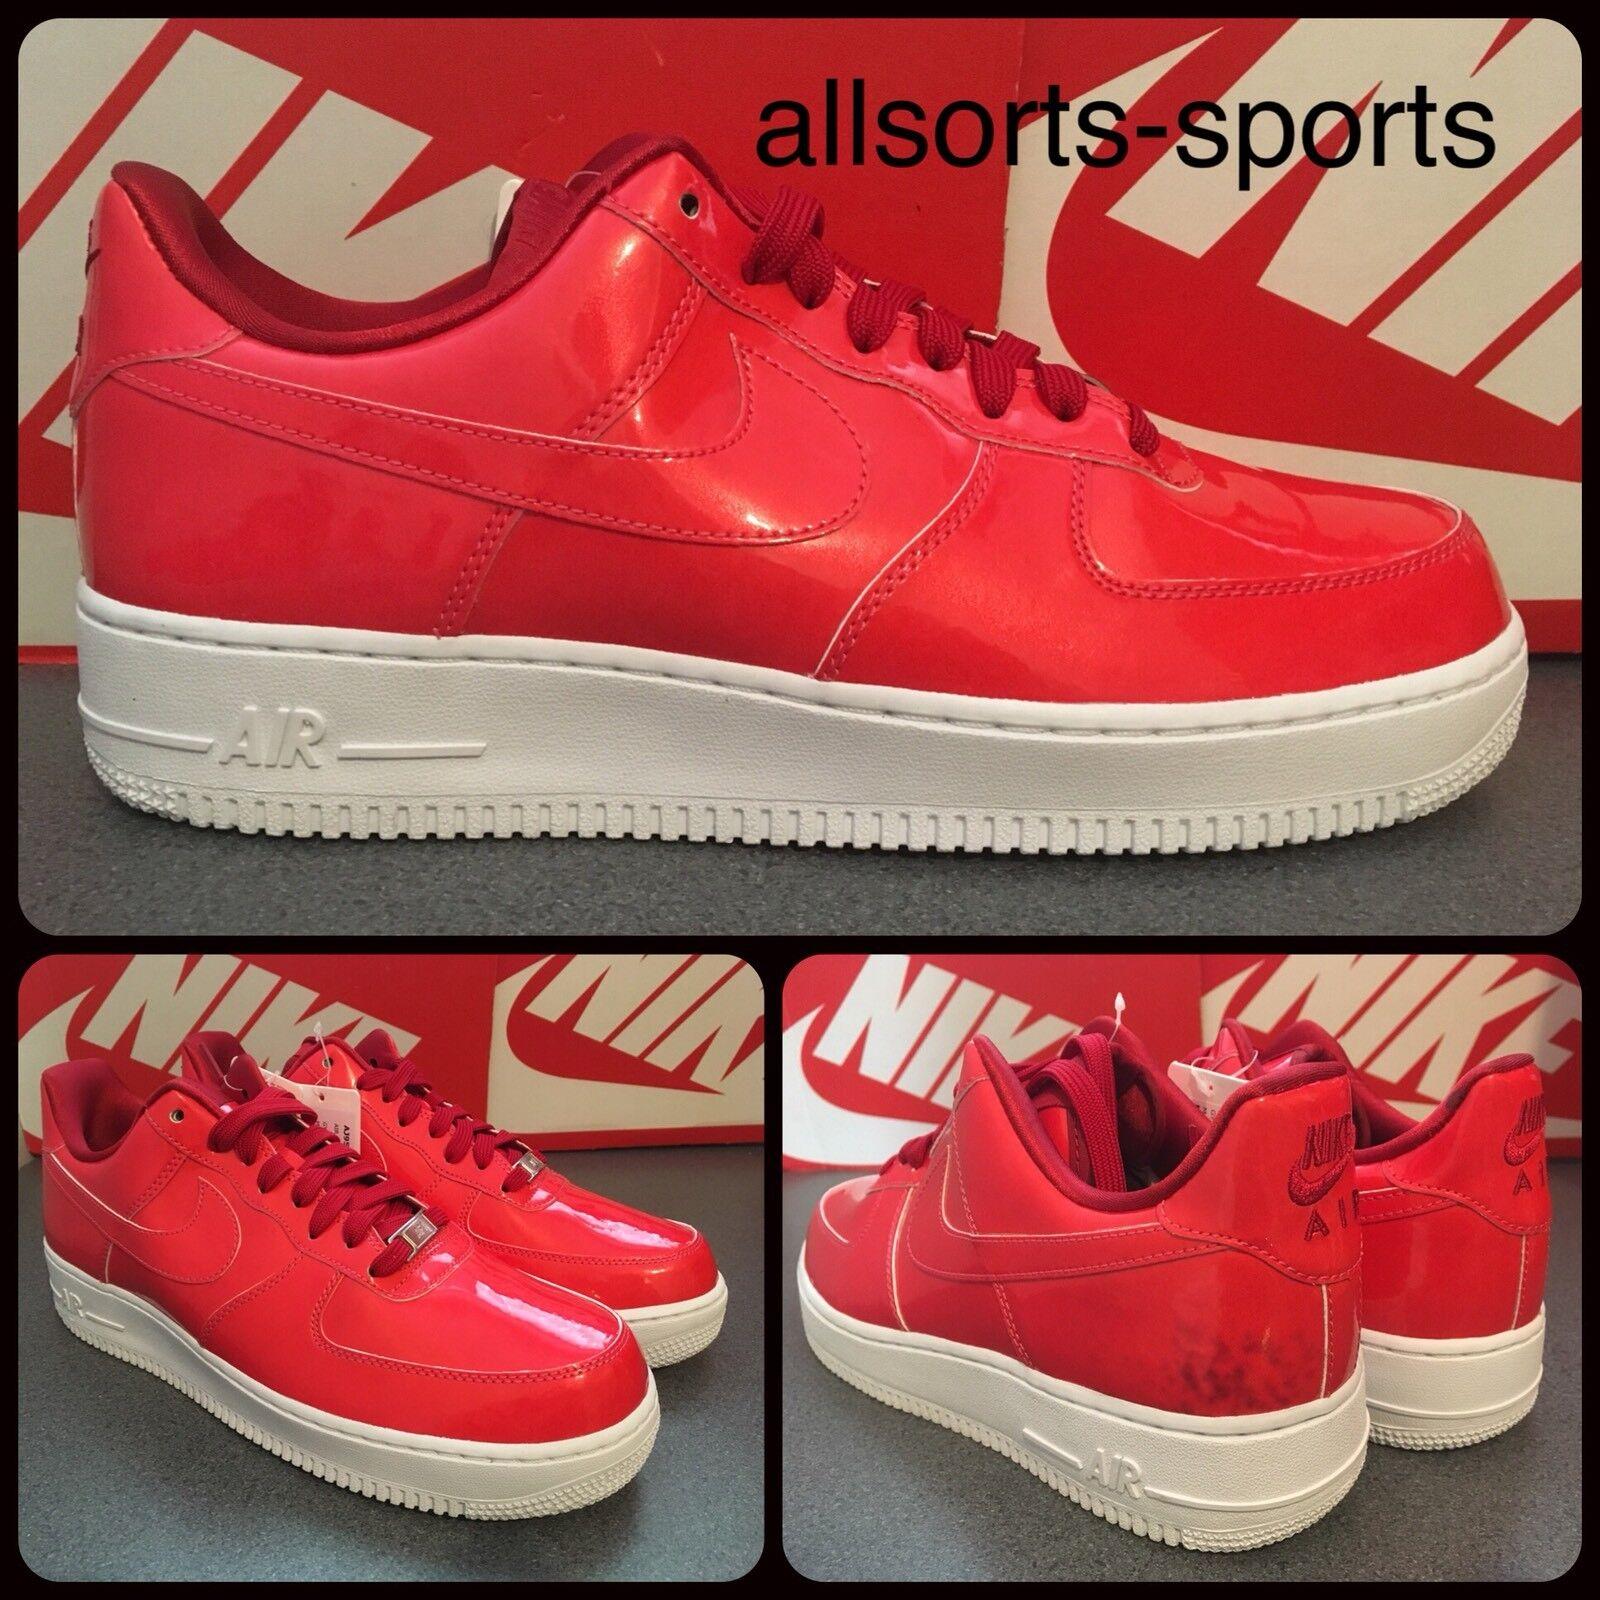 Muestra Nike Force 1'07 LV8 UV Air Sirena AJ9505-600 Sirena Air Rojo Blanco 607dea